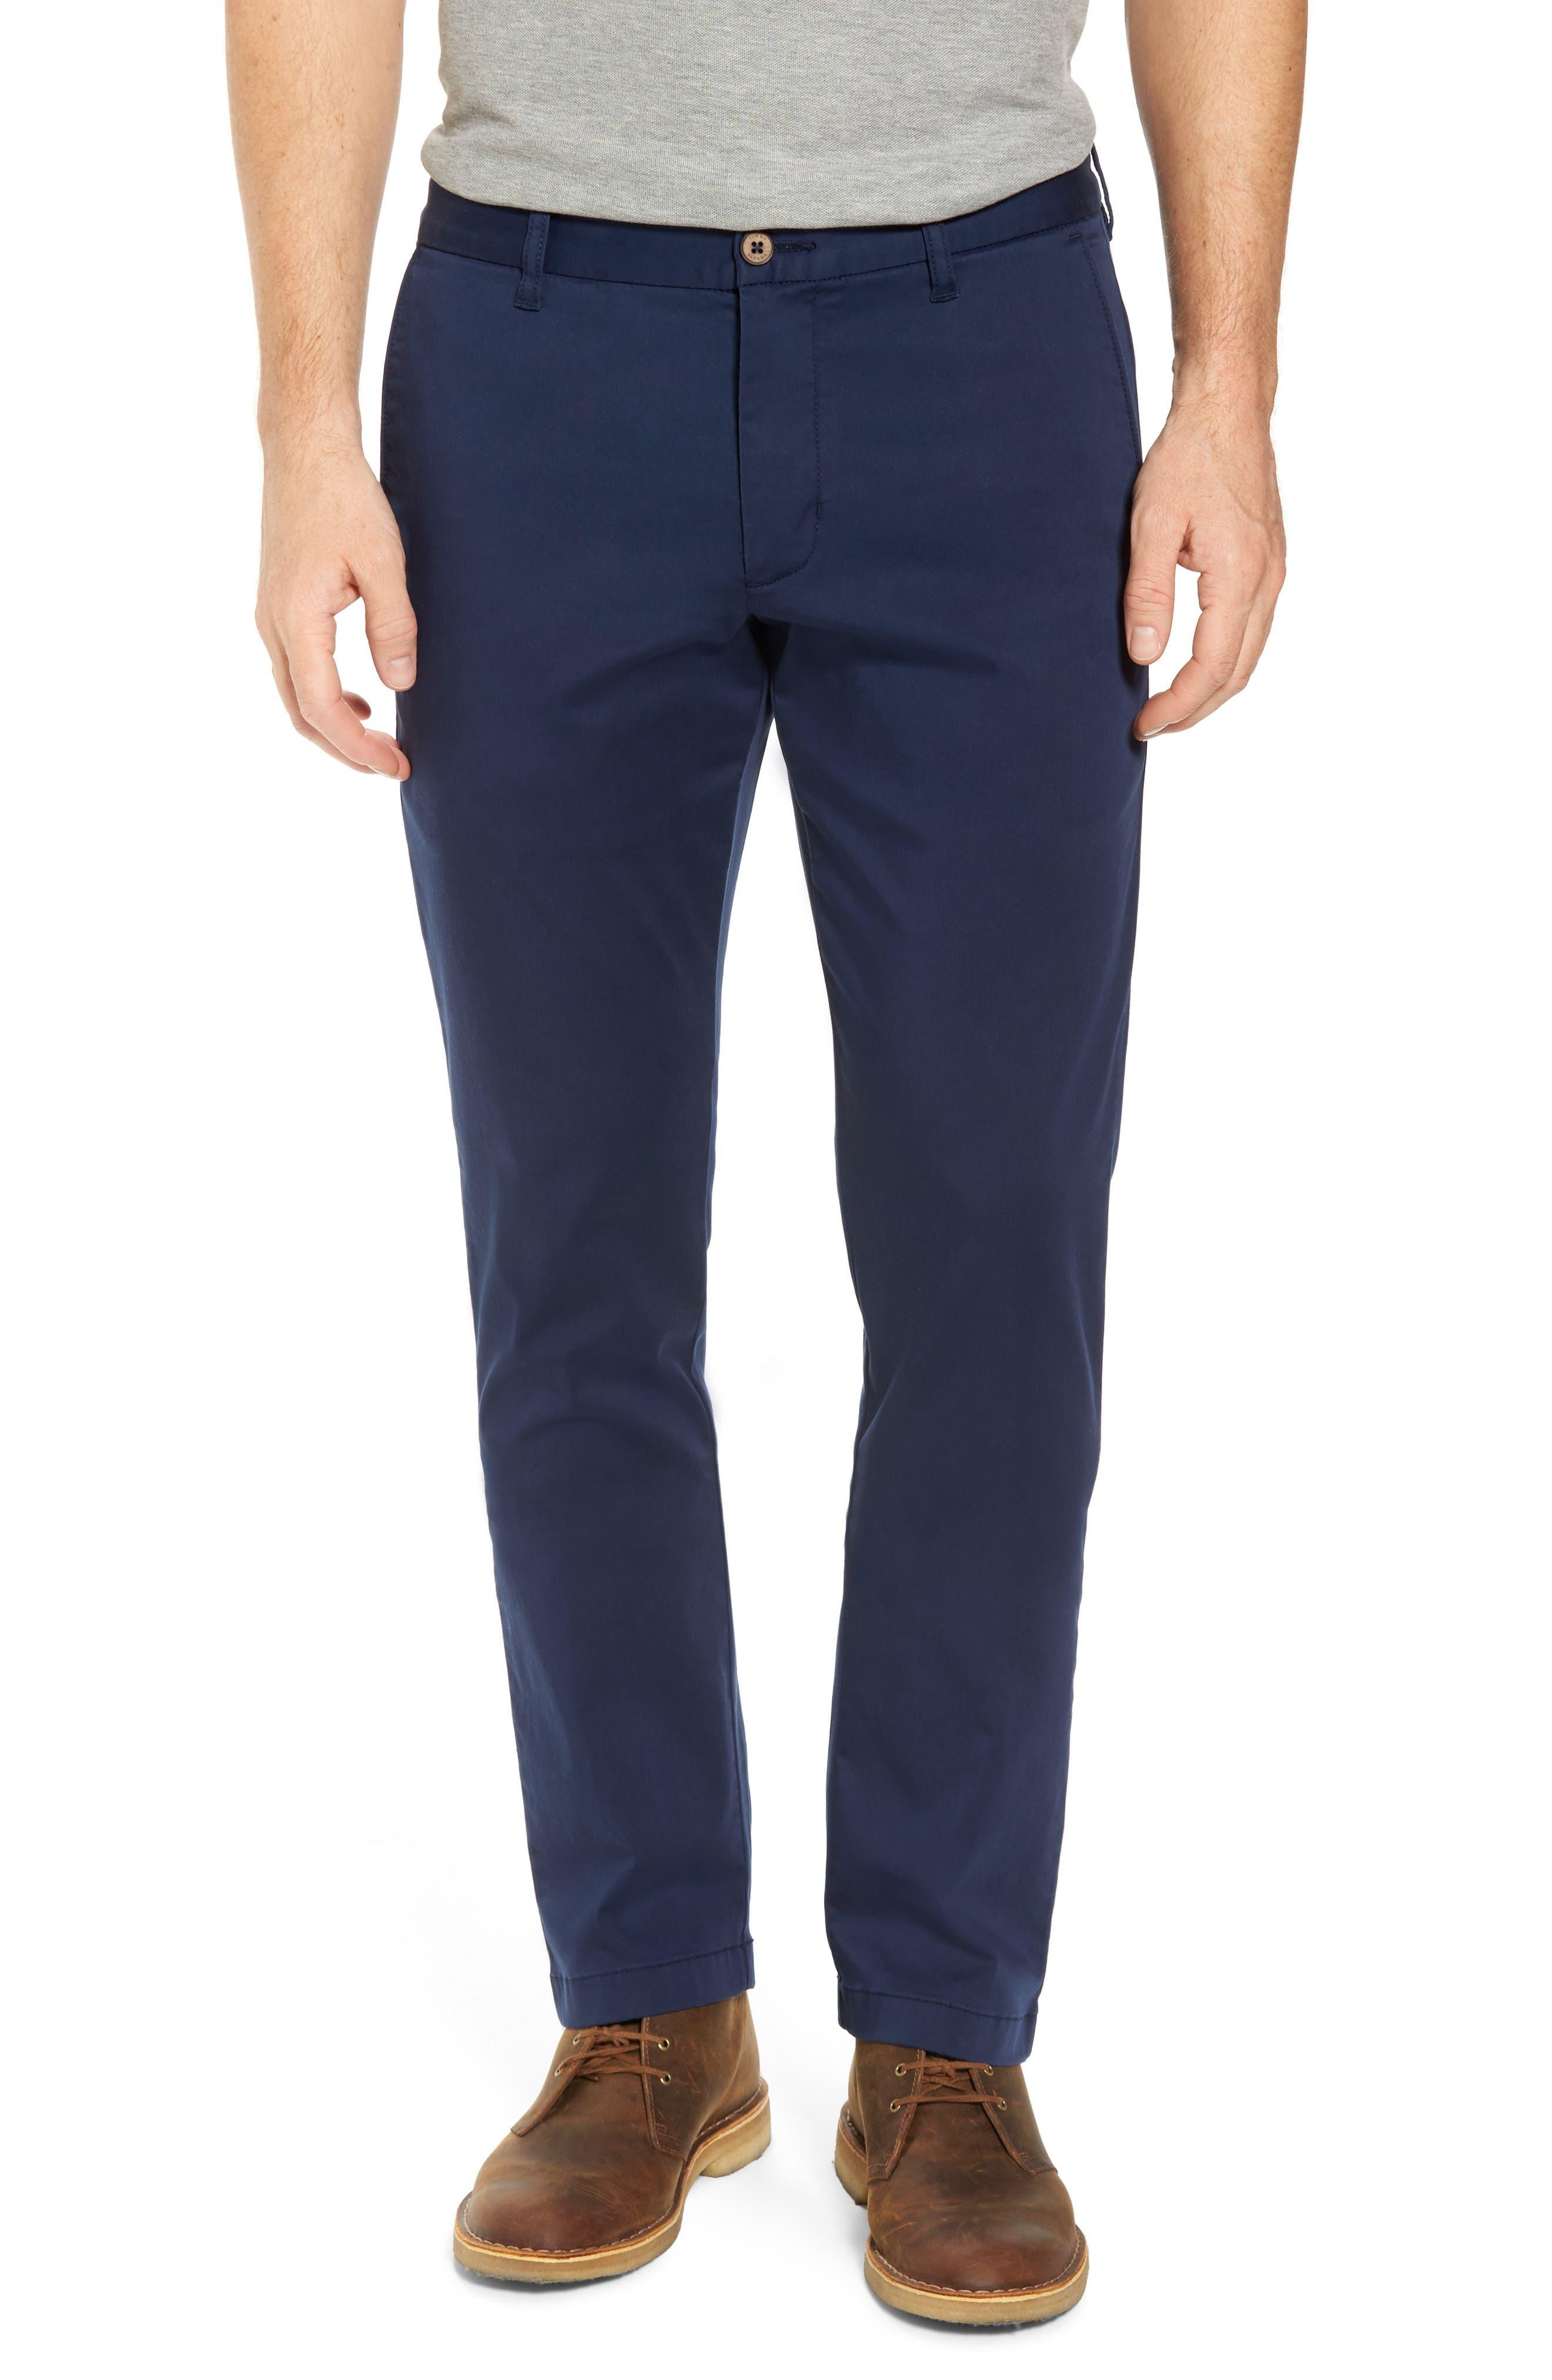 Men's Tommy Bahama Boracay Straight Leg Flat Front Pants